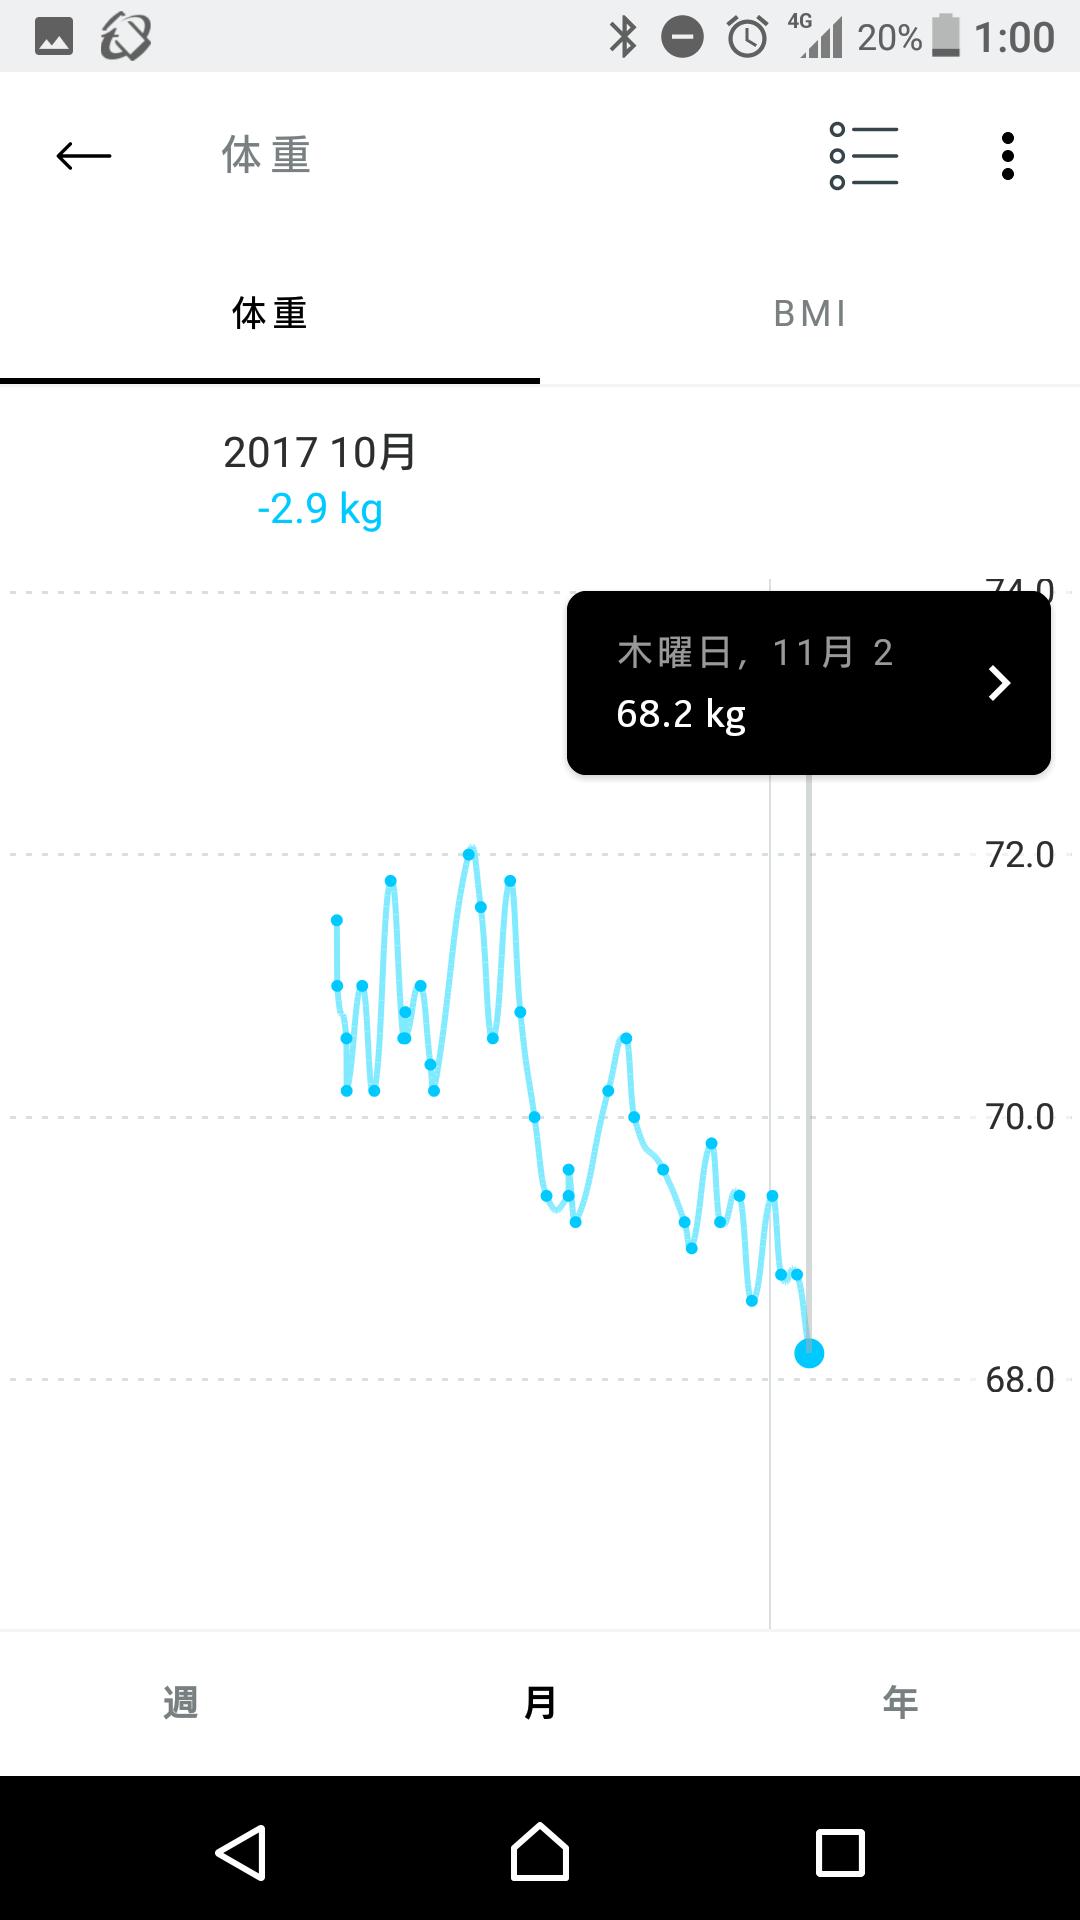 NOKIAの体重計のグラフ